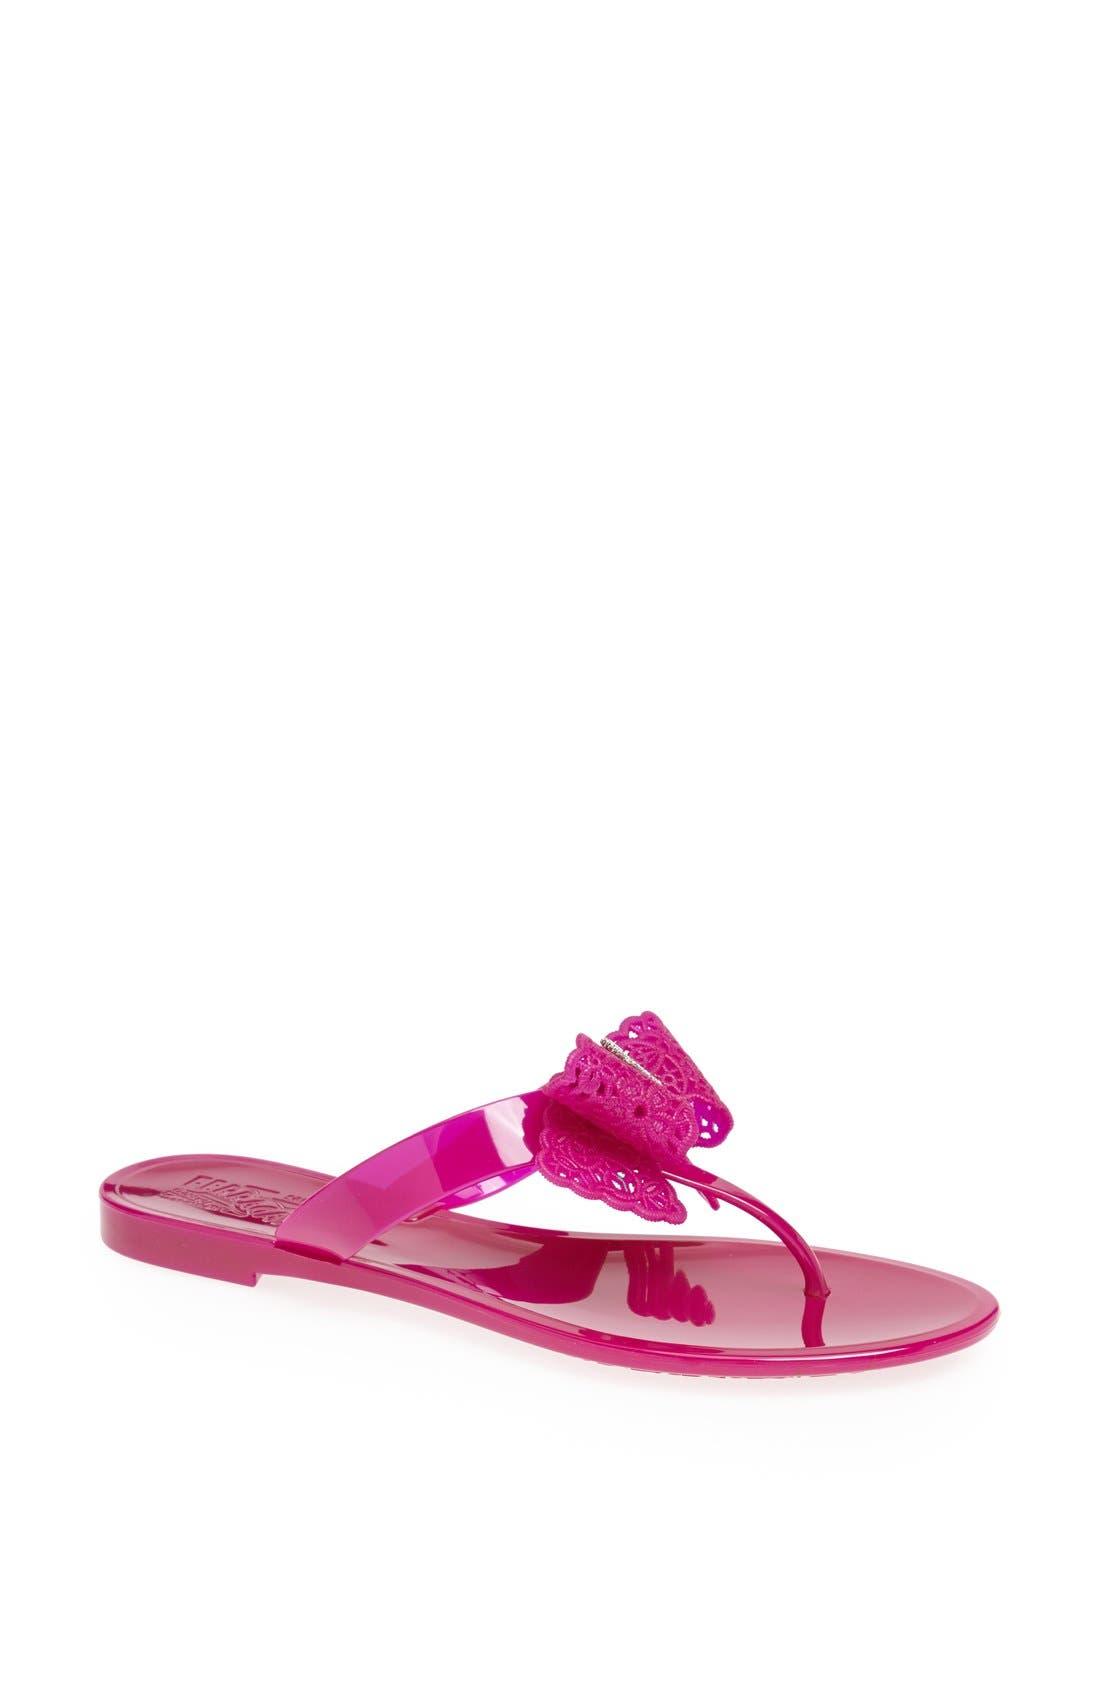 Alternate Image 1 Selected - Salvatore Ferragamo 'Pandy' Sandal